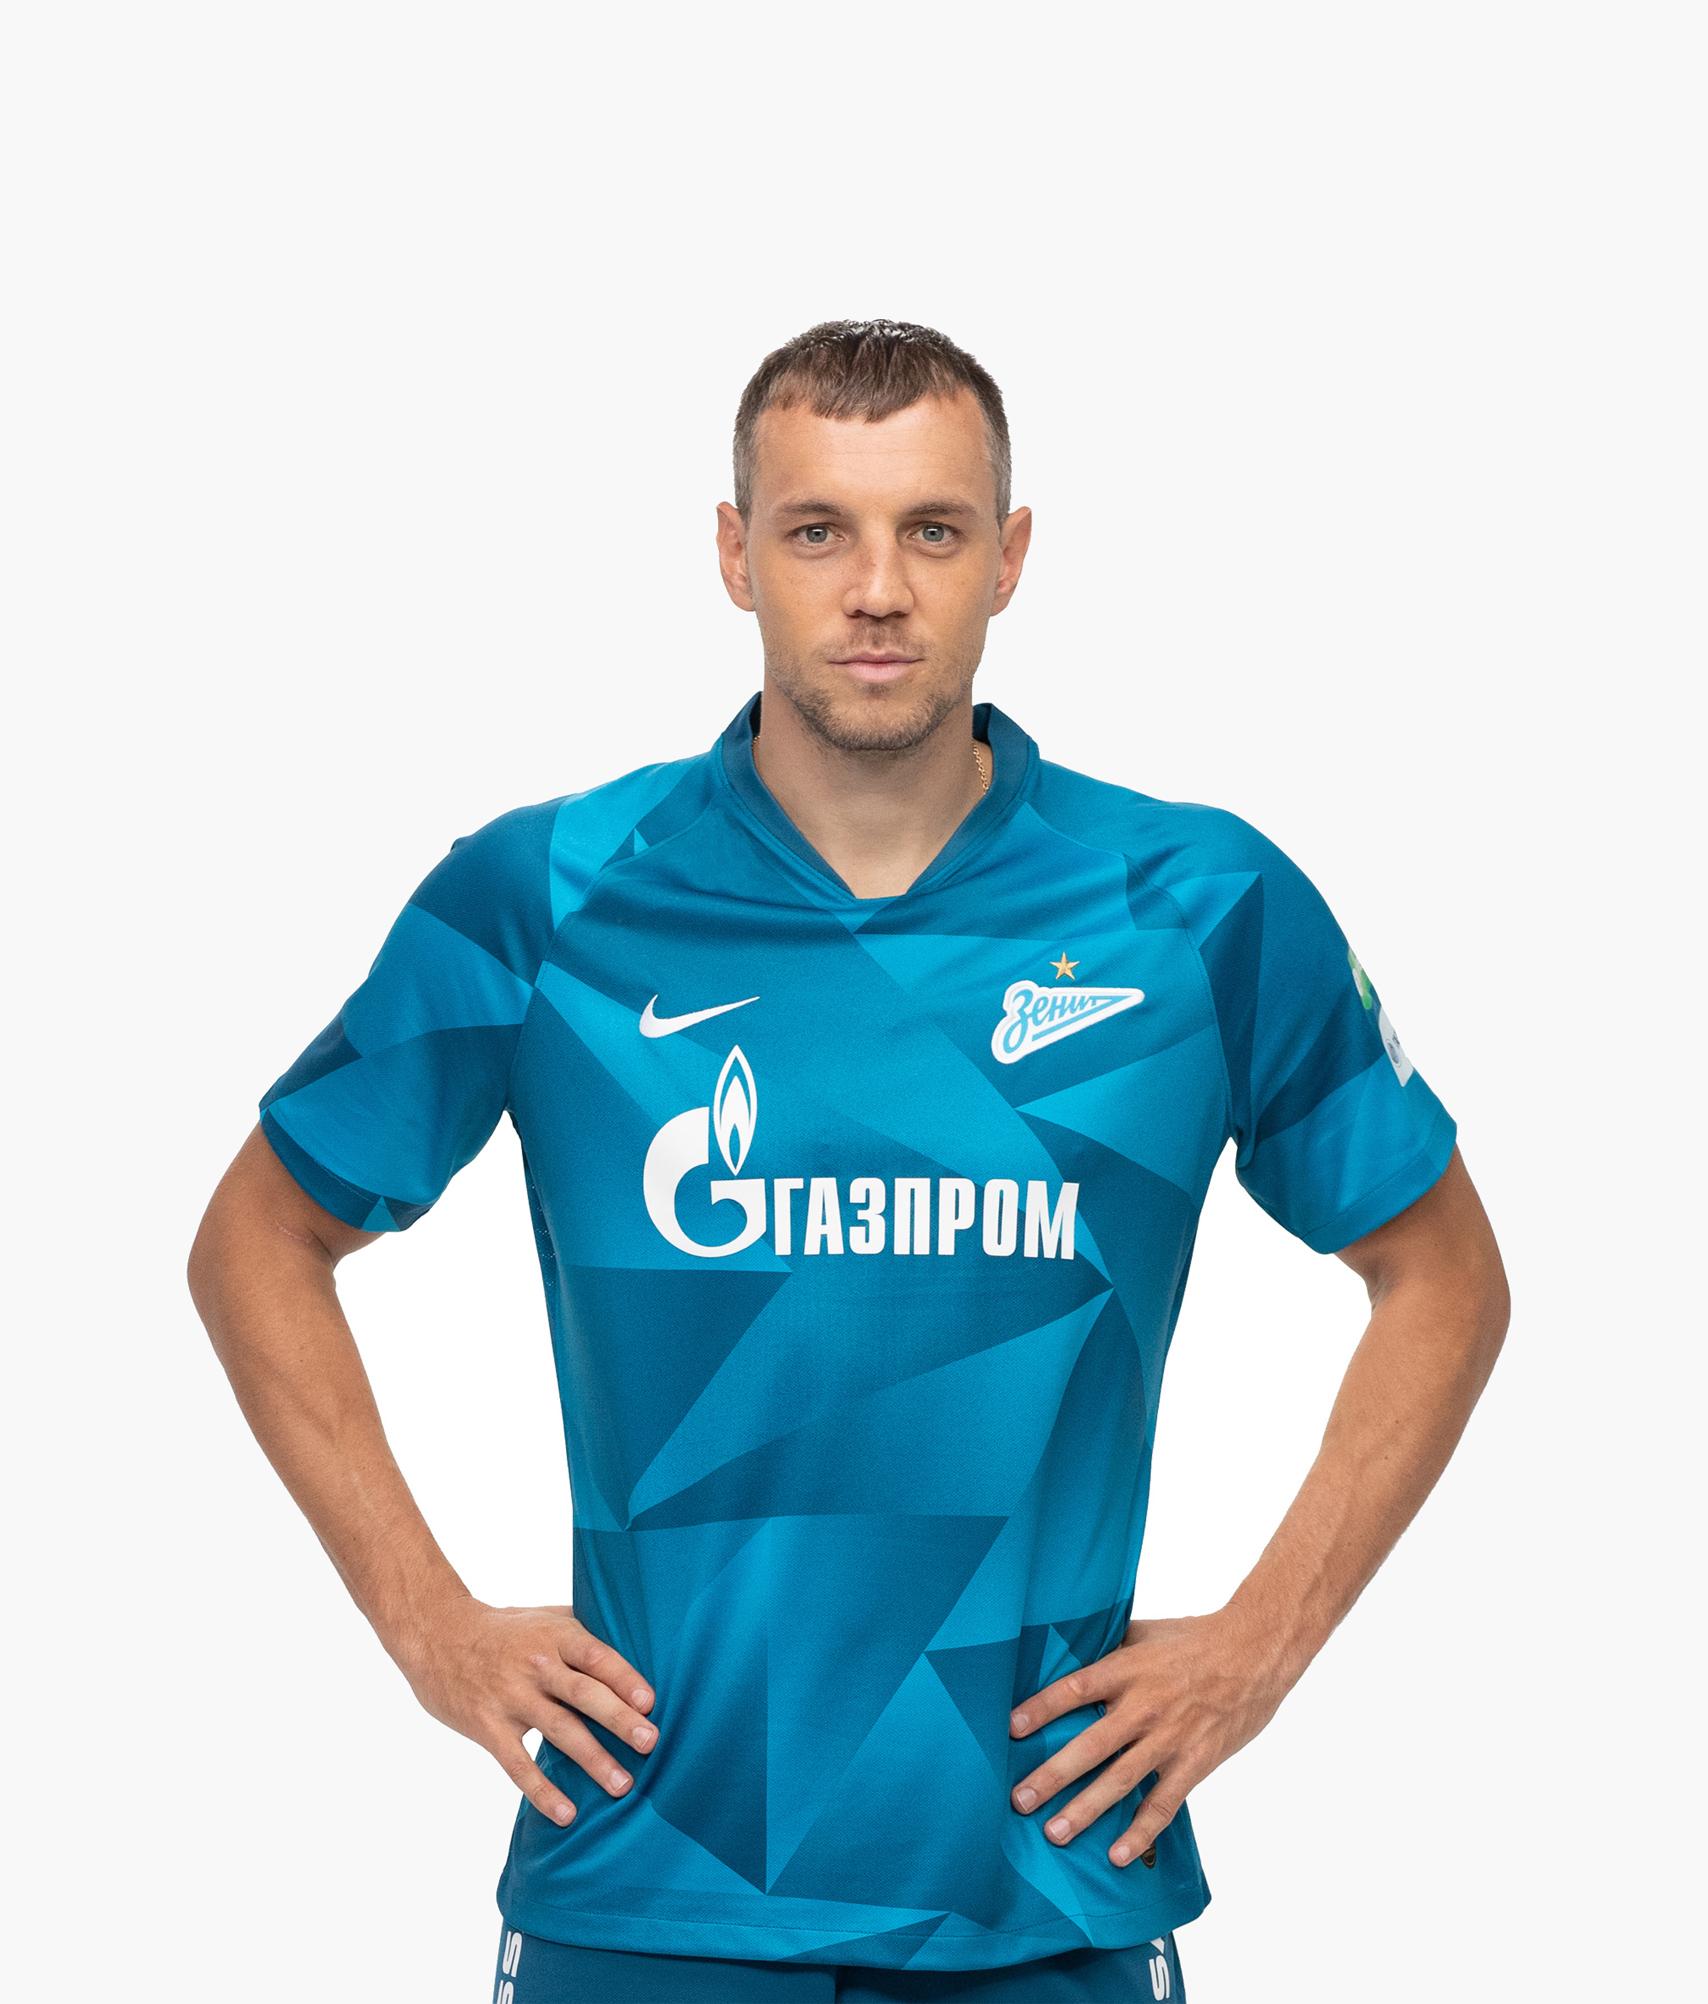 Оригинальная домашняя футболка Nike сезона 2019/20 Nike Цвет-Синий оригинальная домашняя футболка nike дзюба 22 2018 19 nike